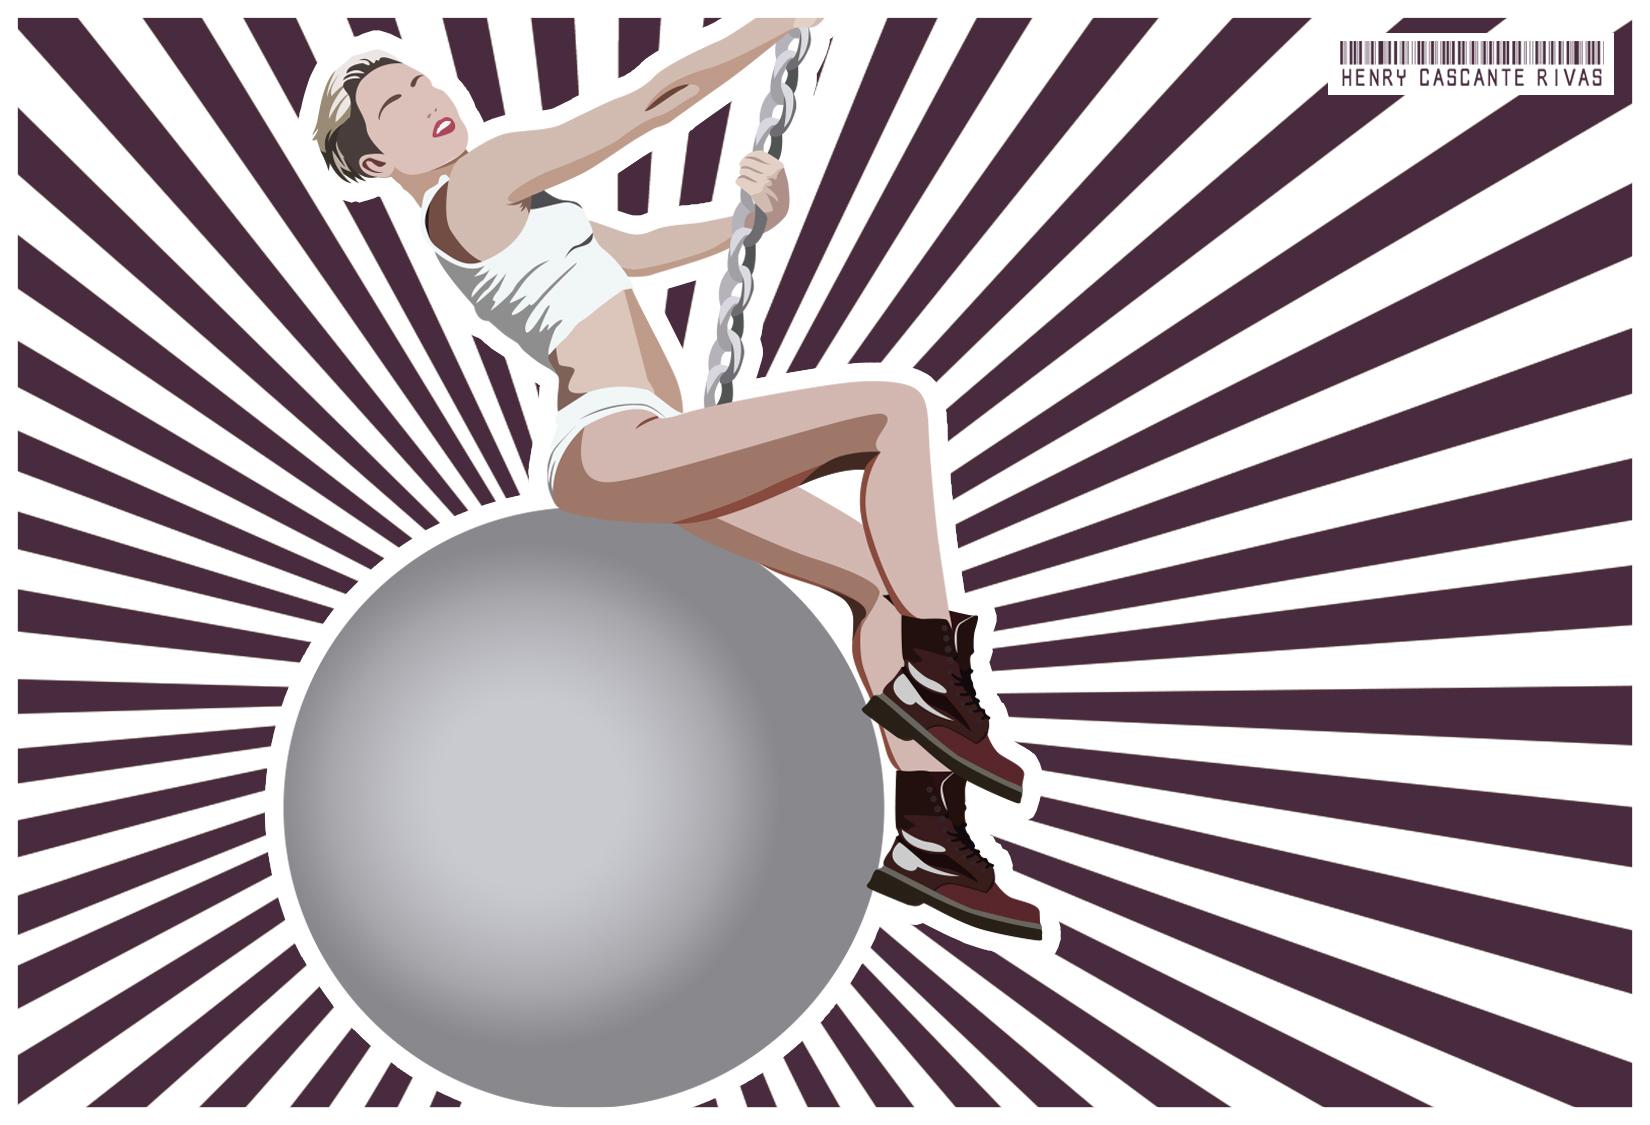 Miley Cyrus Wrecking Ball Clip Art.